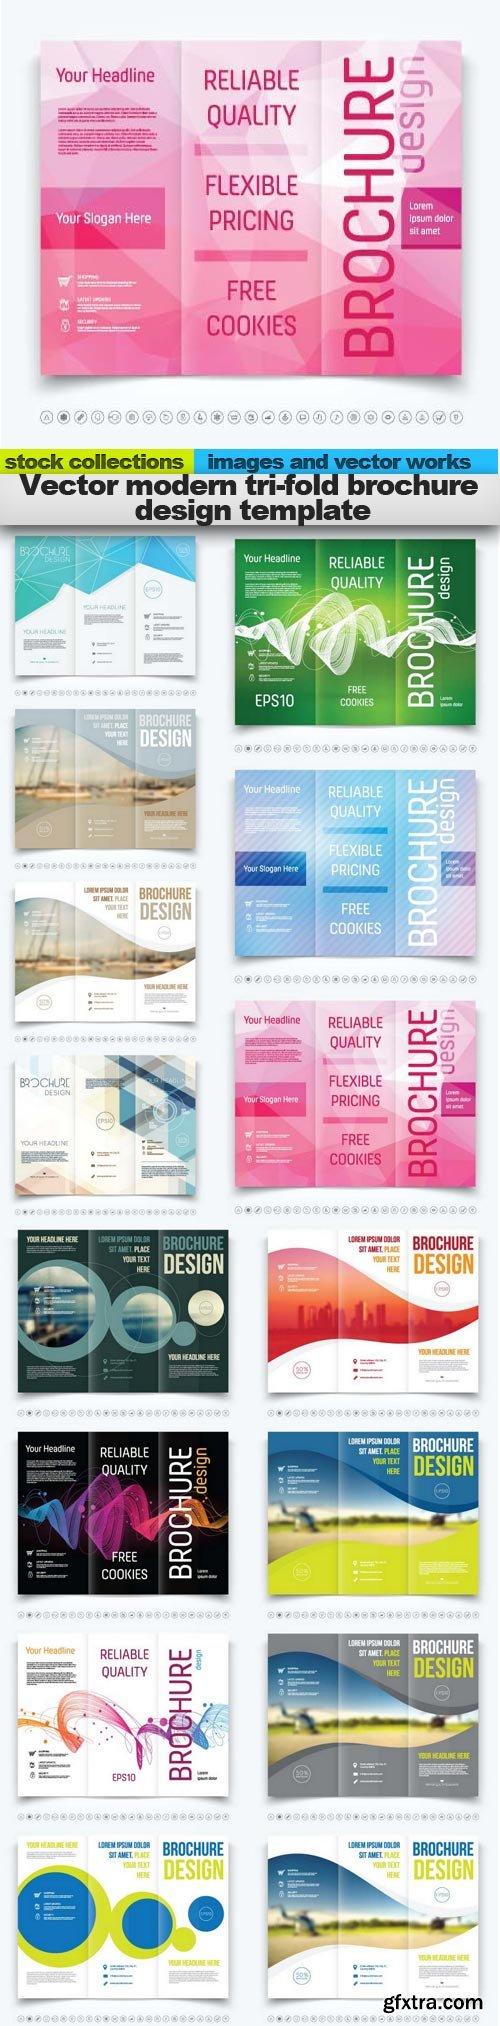 Vector modern tri-fold brochure design template, 15 x EPS